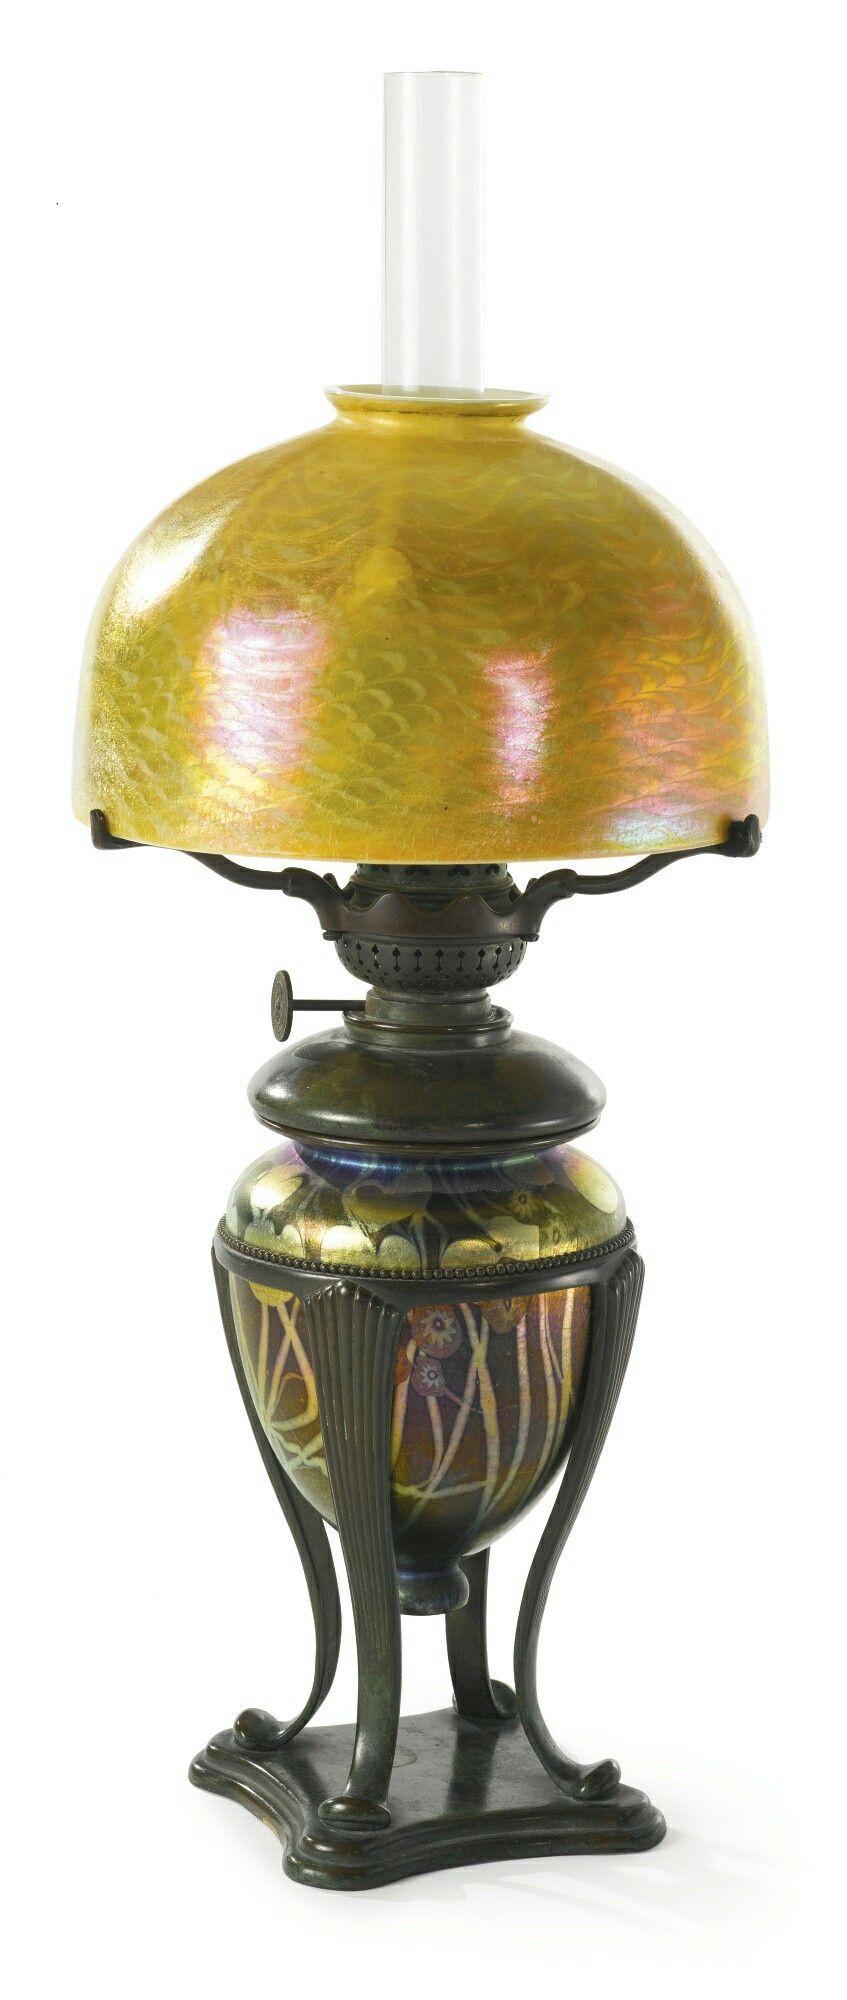 Tiffany Studios TABLE LAMP. Antique oil lamps, Oil lamps